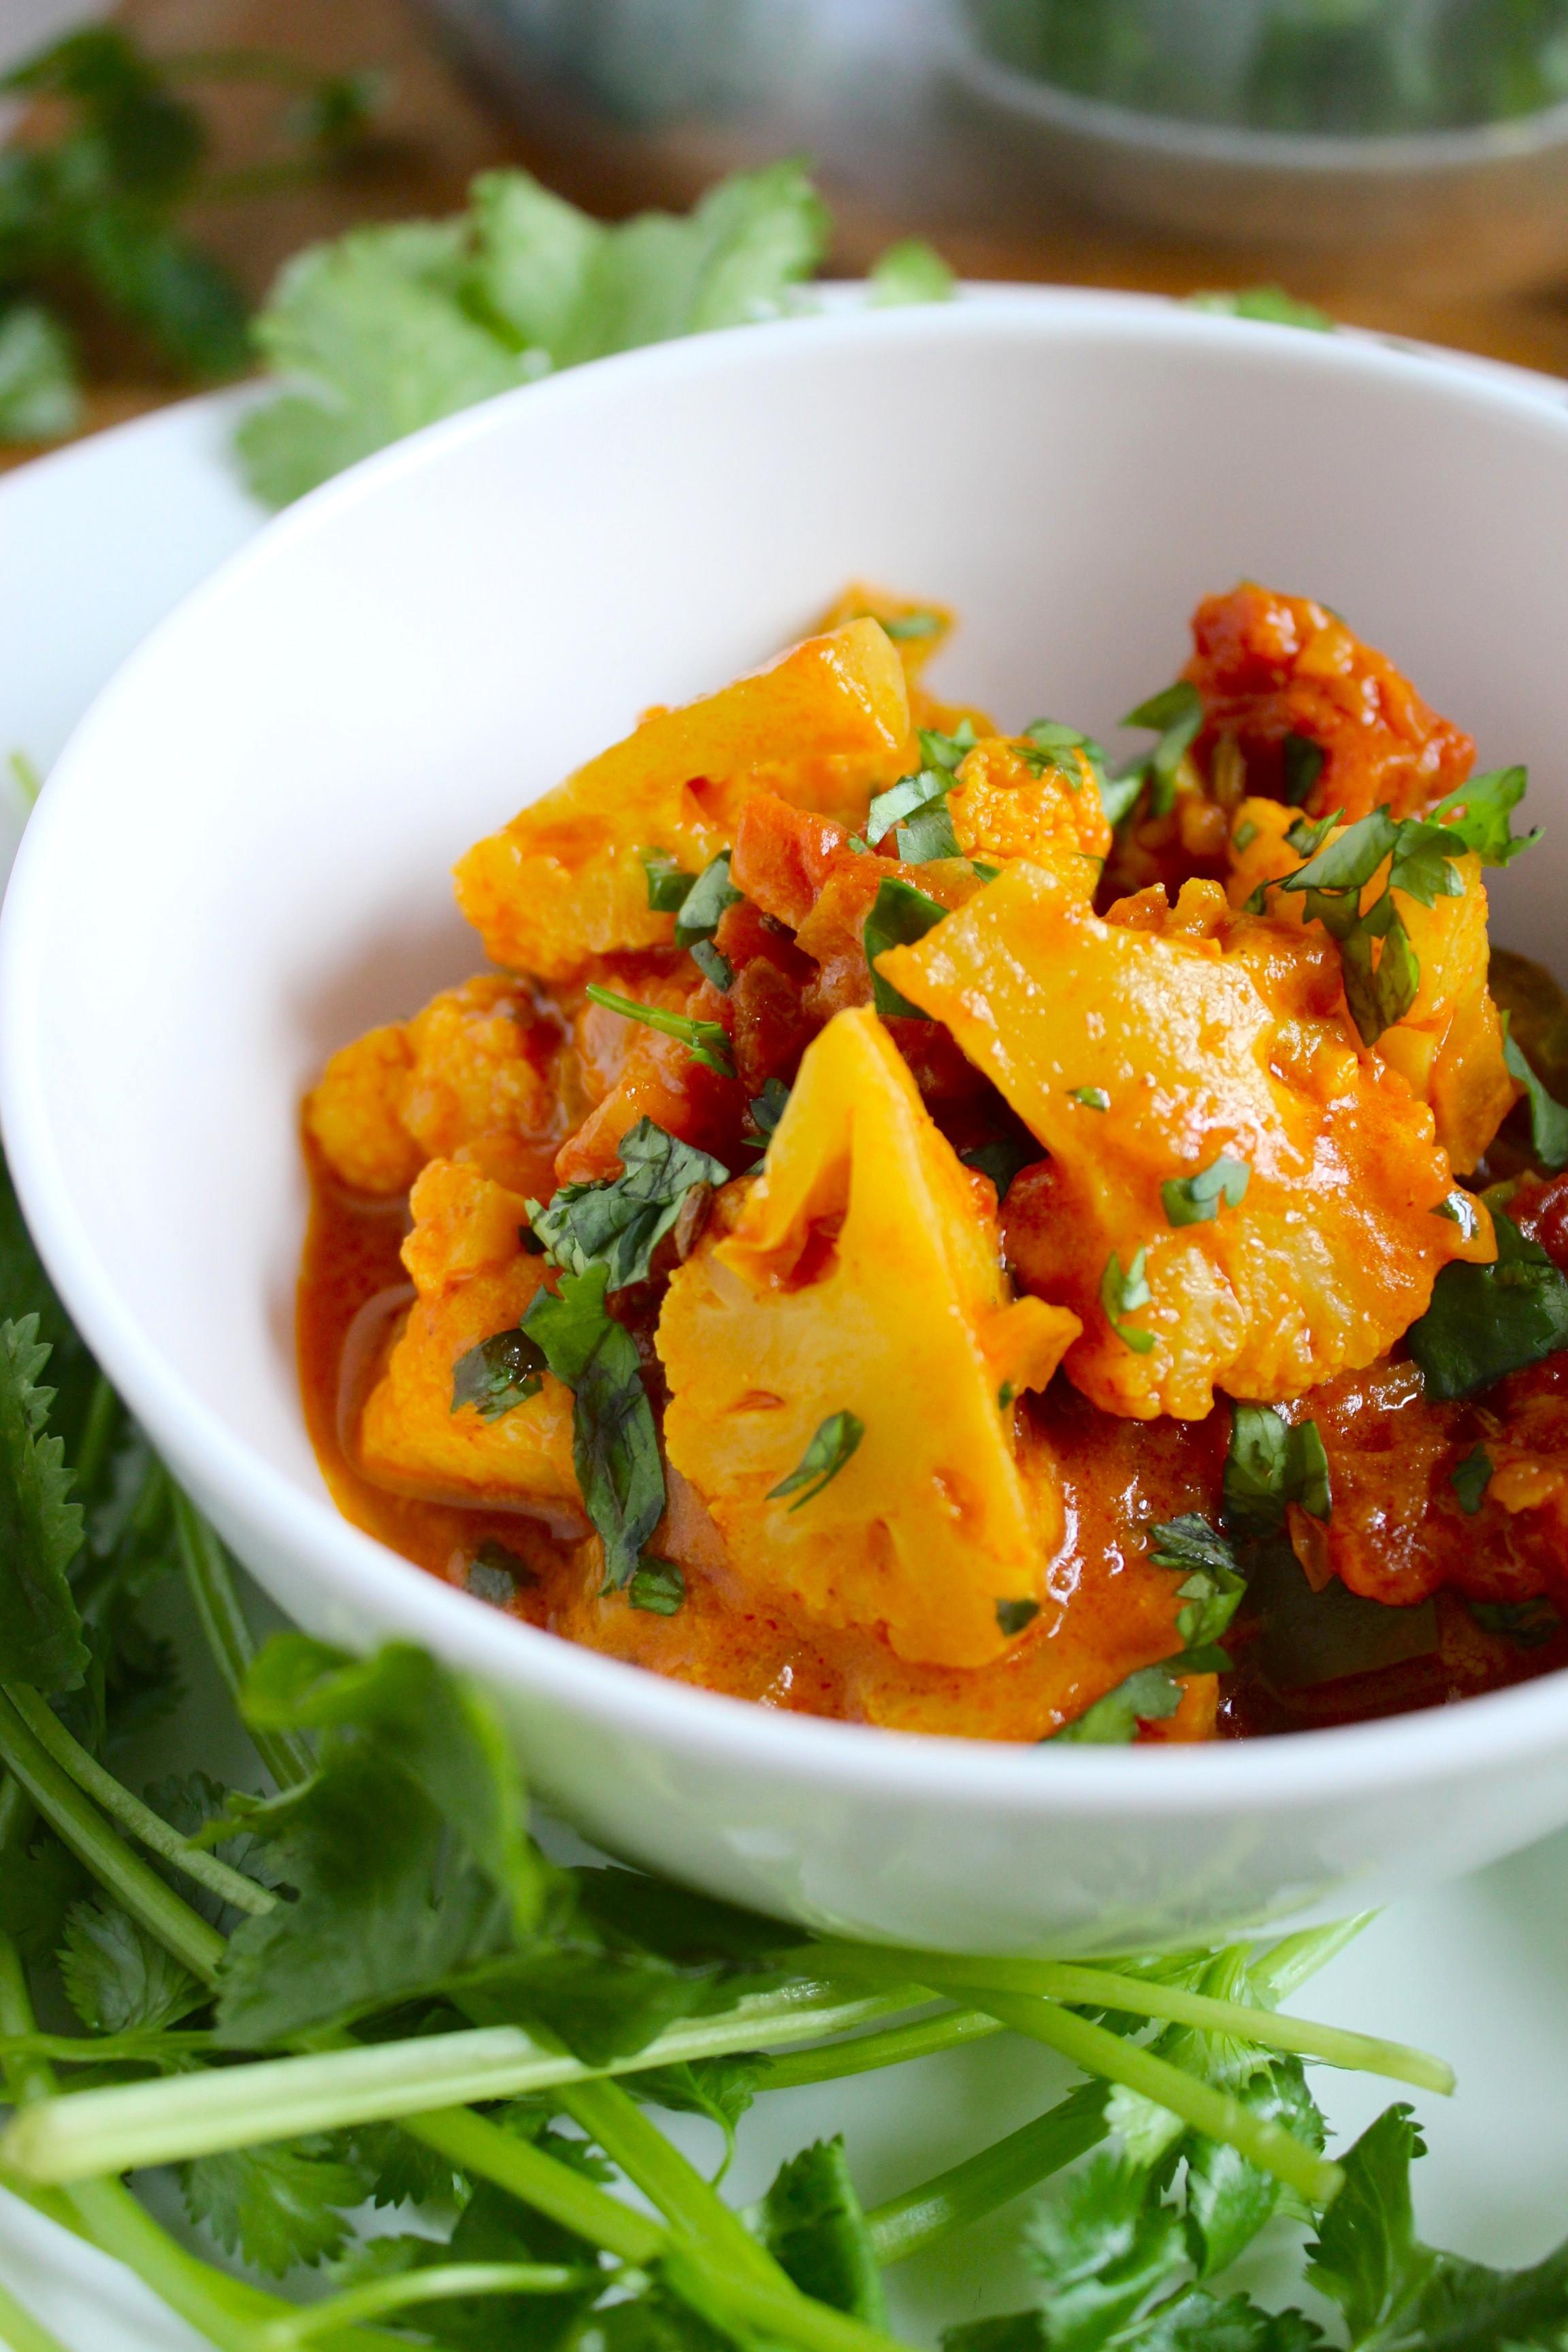 Cauliflower Vegan Recipes  Easy Vegan Cauliflower Curry from The Fitchen